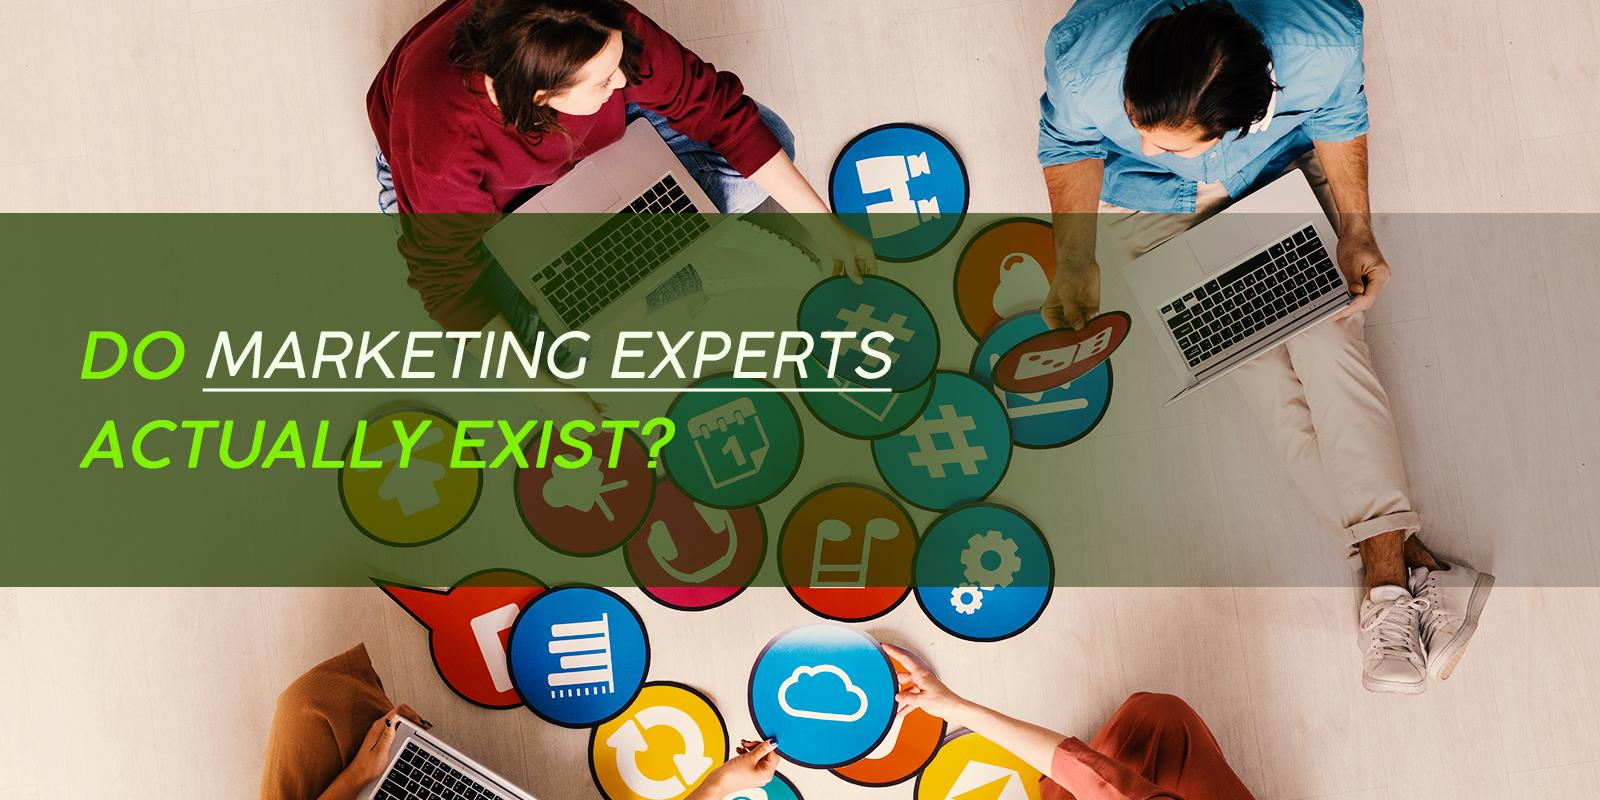 Do Marketing Experts Actually Exist?